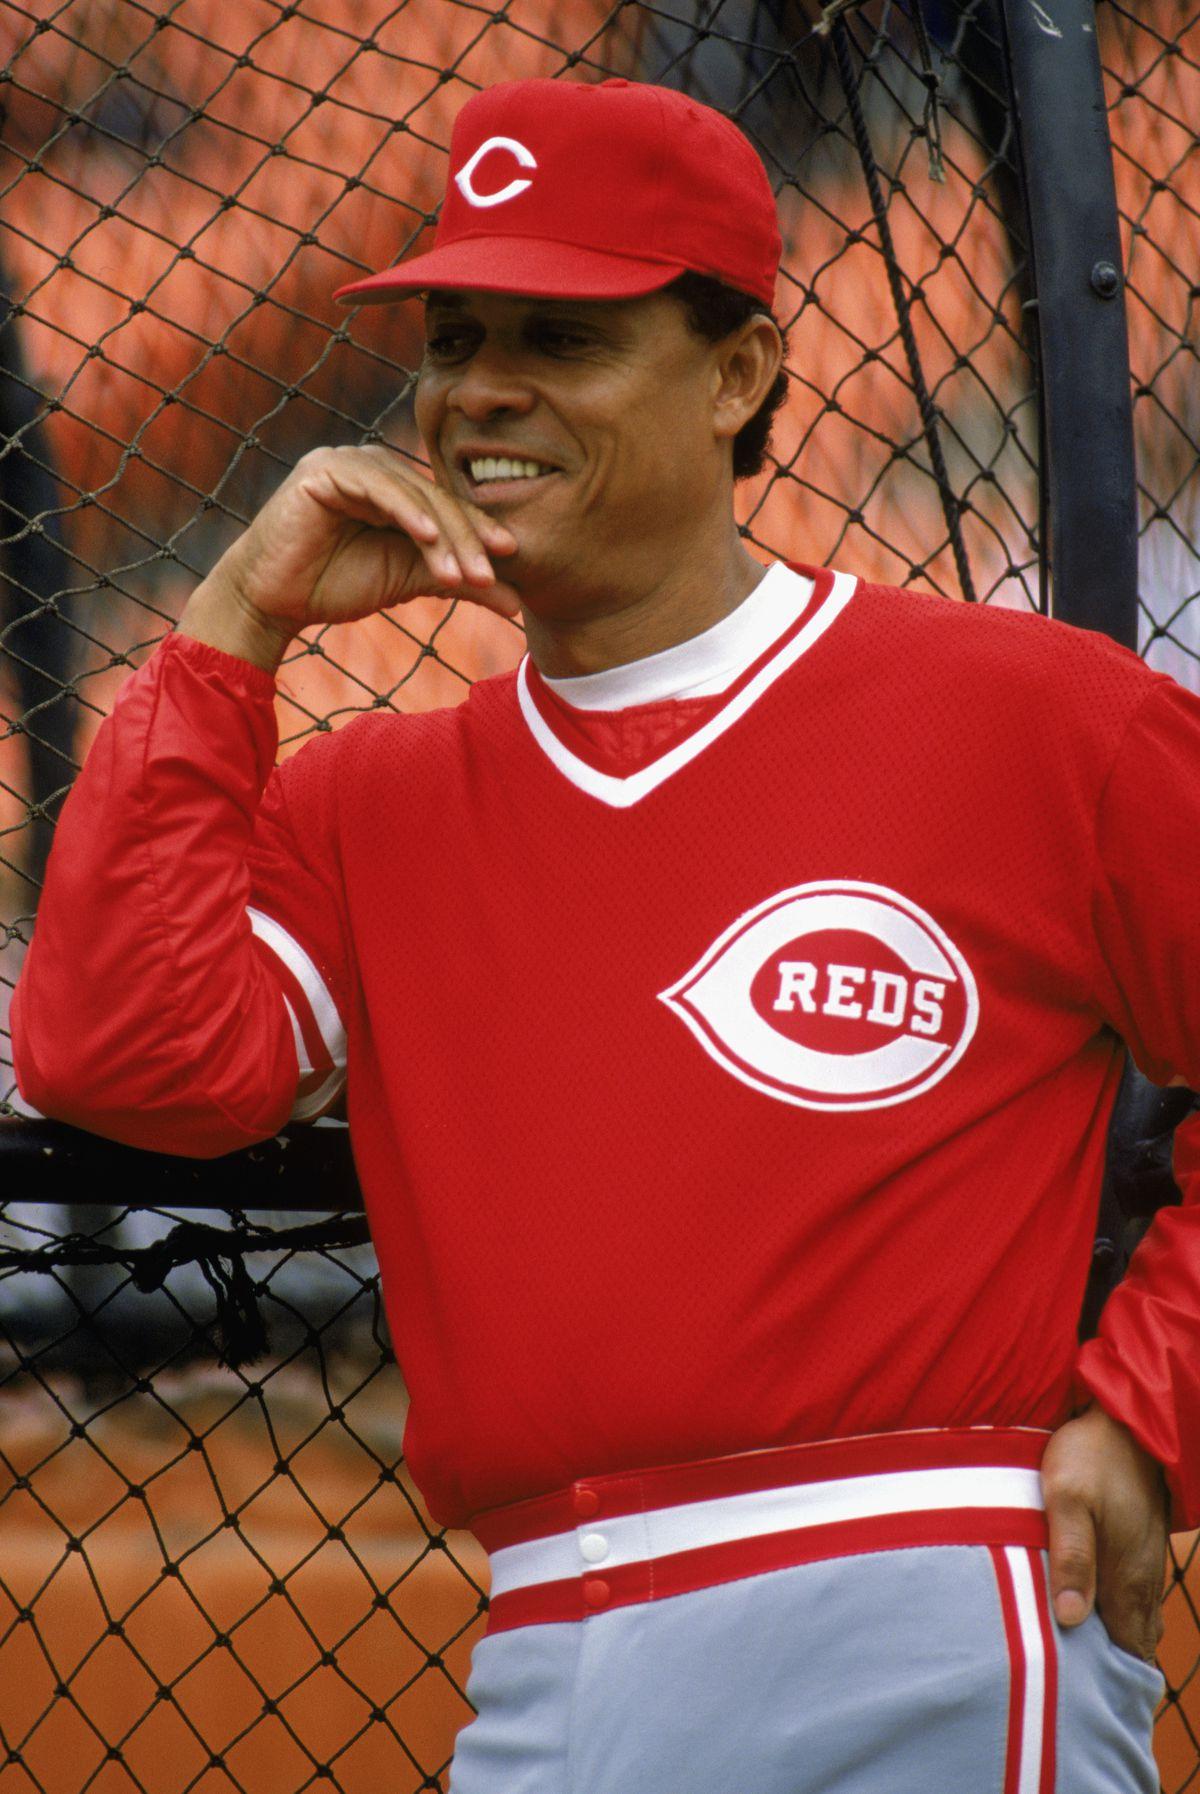 Tony Perez looks on